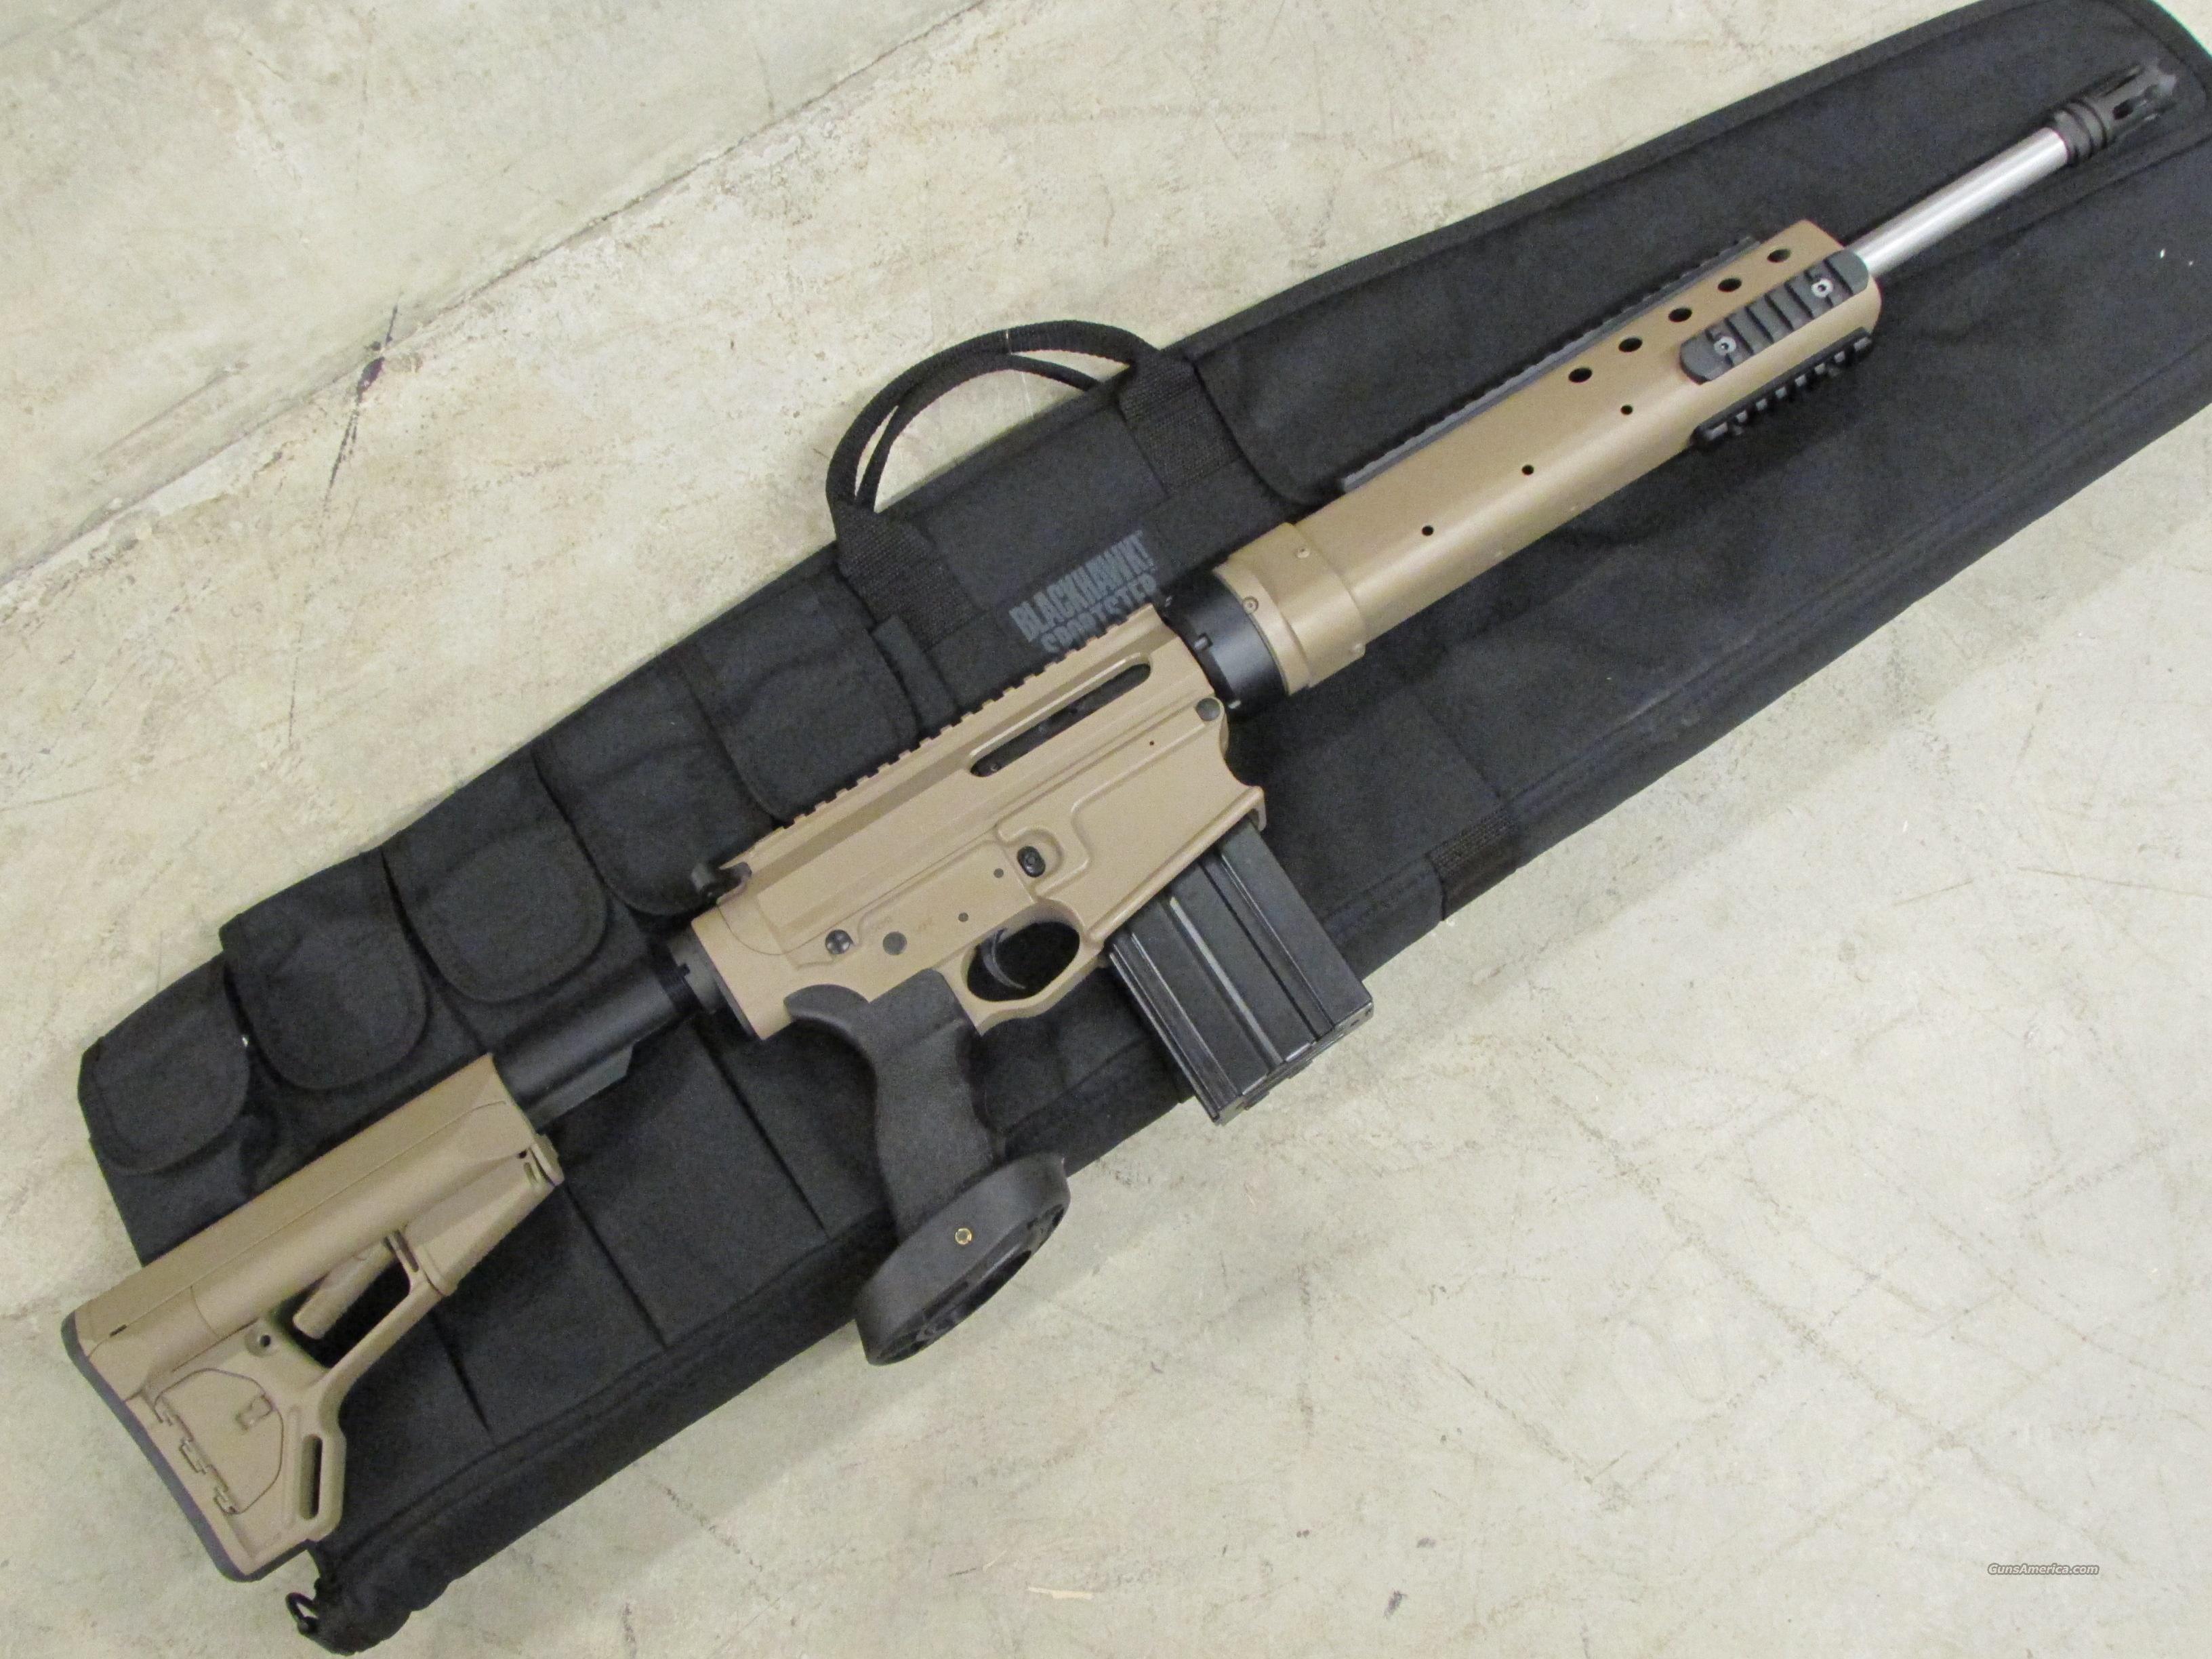 Intacto Arms Athena 3 Carbon Tac AR-10 .308 Win Cerakote FDE  Guns > Rifles > AR-15 Rifles - Small Manufacturers > Complete Rifle